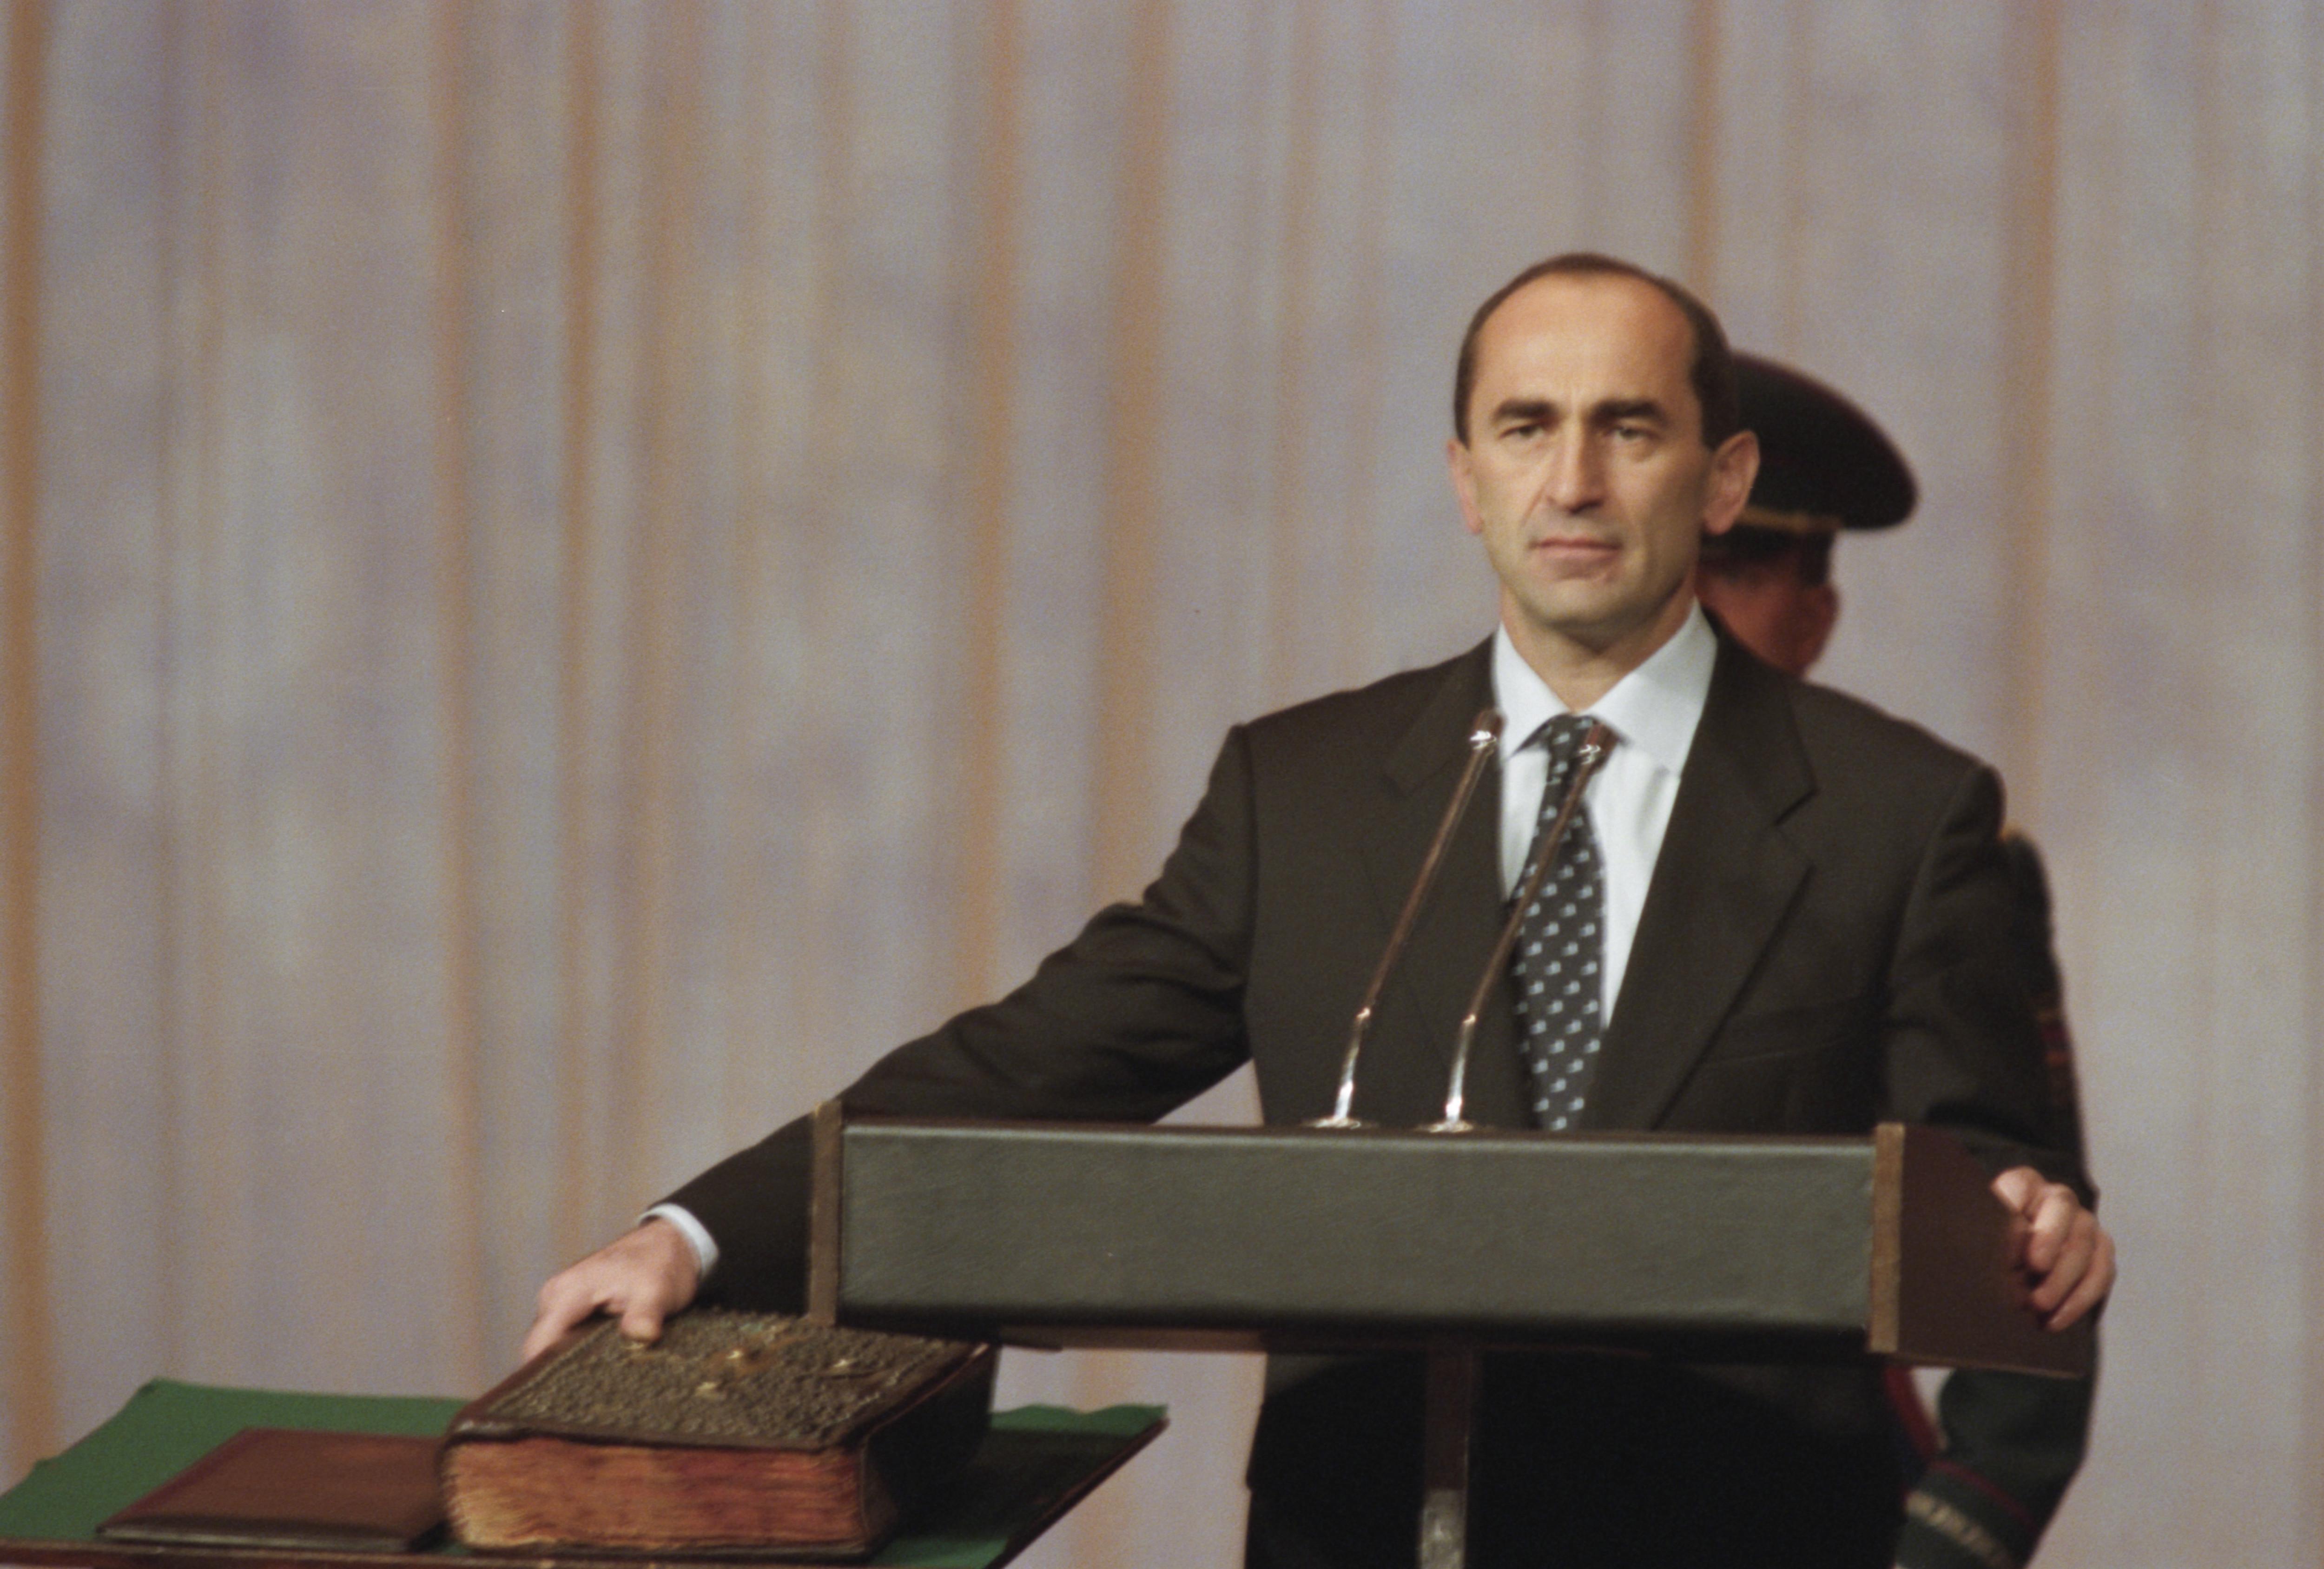 Конституционный суд Армении остановил дело экс-президента Кочаряна